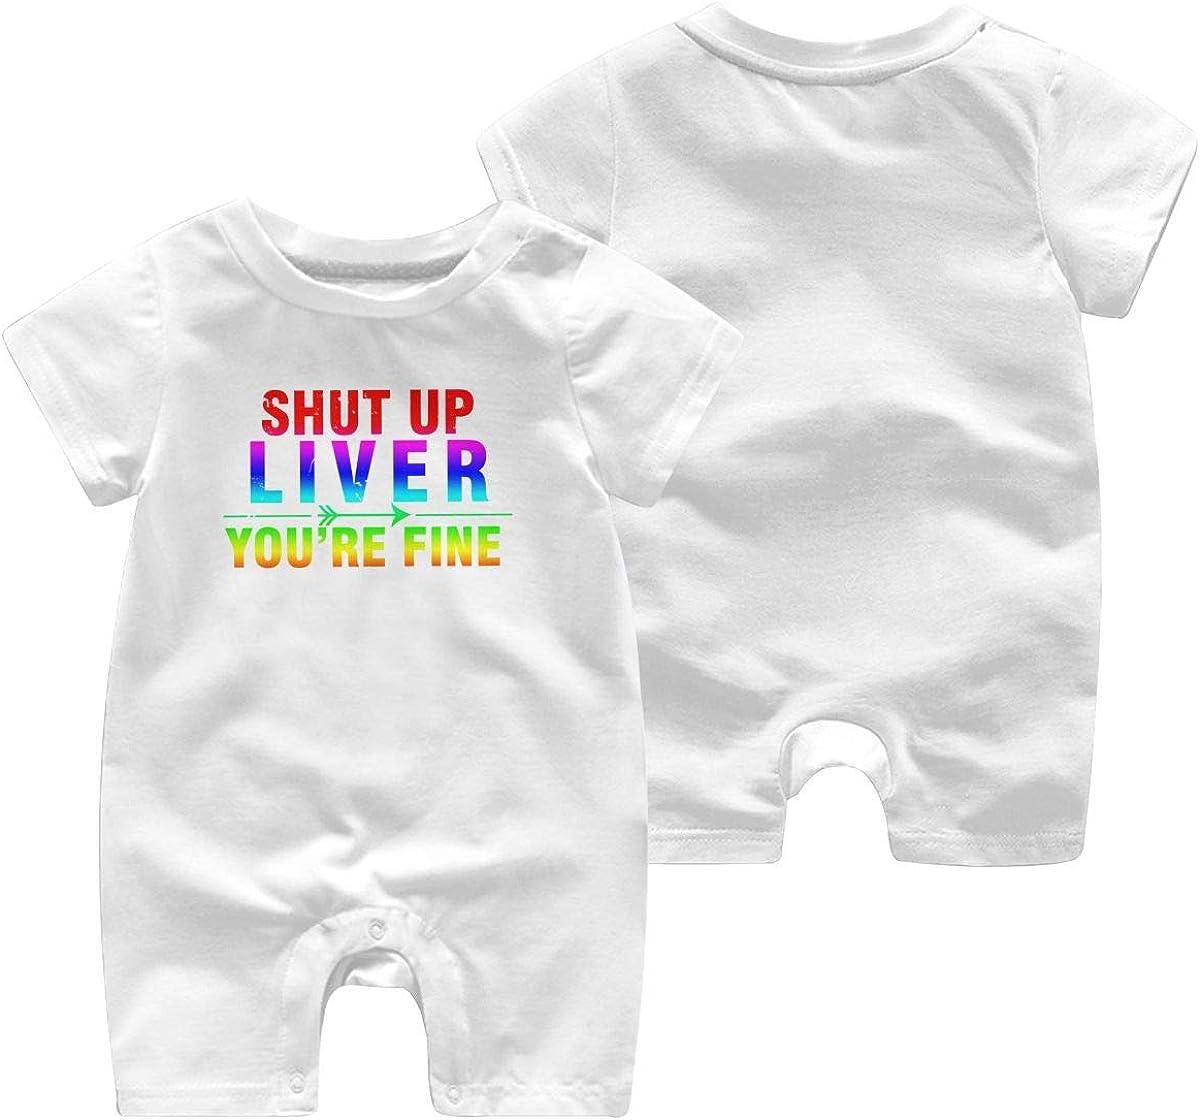 KBIZO-zxl Baby Short Sleeve Bodysuit Shut Up Liver Youre Fine Baby Boys Girls Onesie Clothes